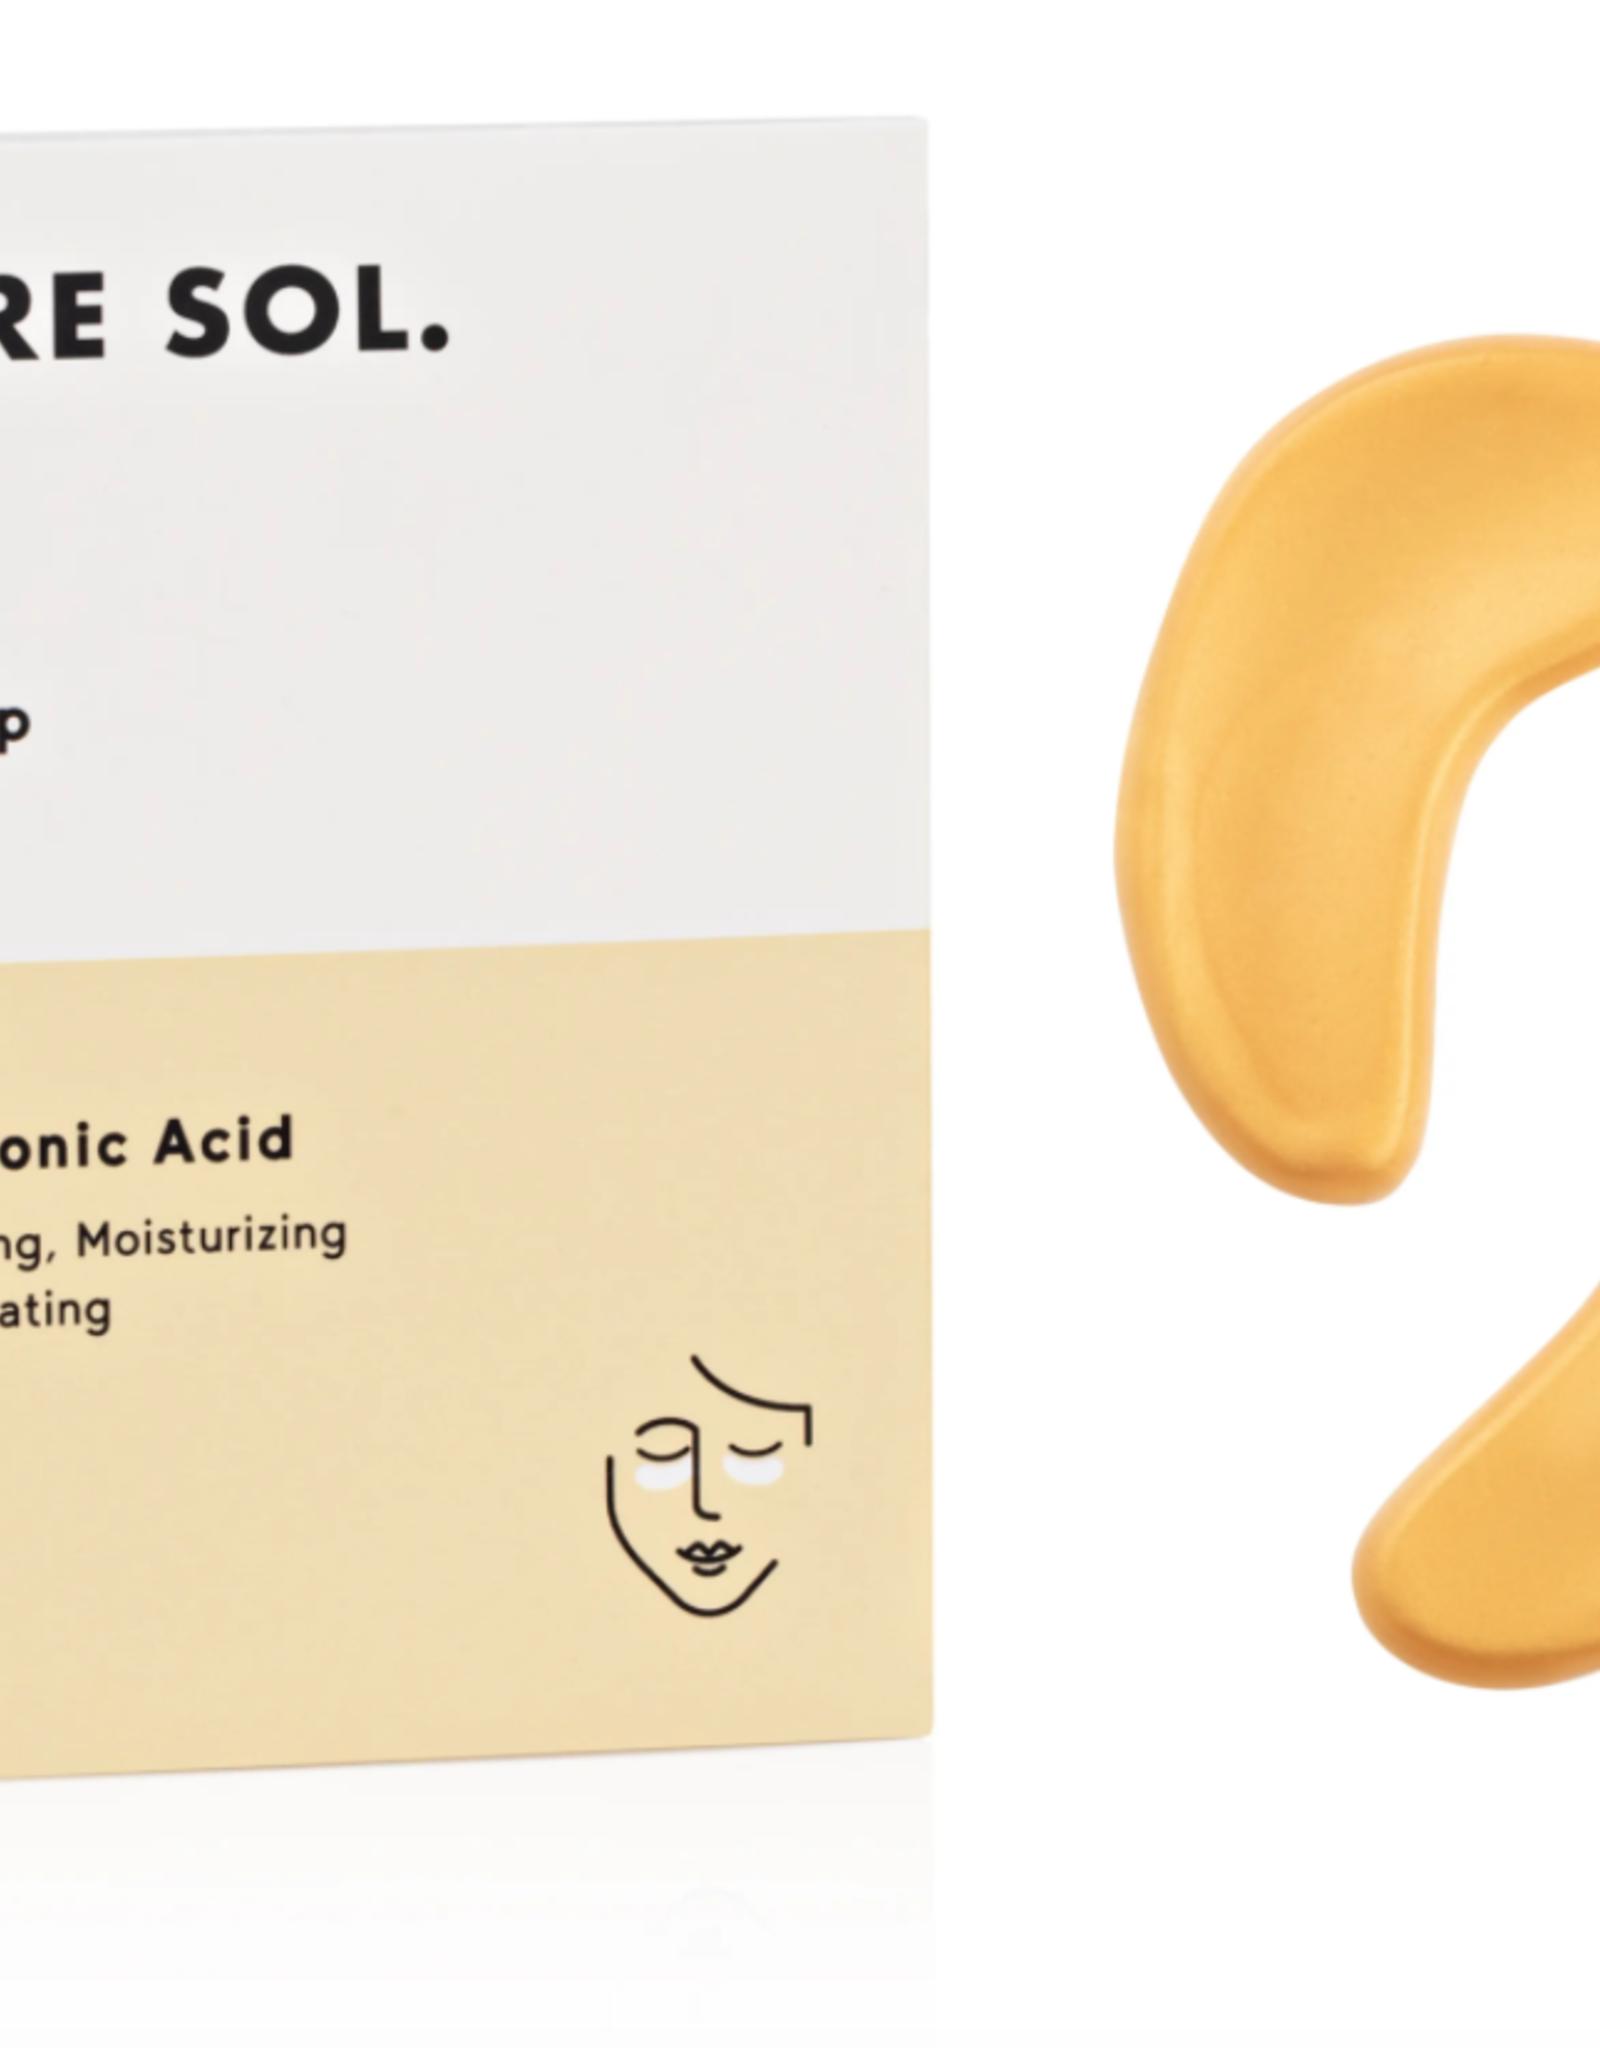 Perk Up - Gold and Hyaluronic Acid Eye Masks